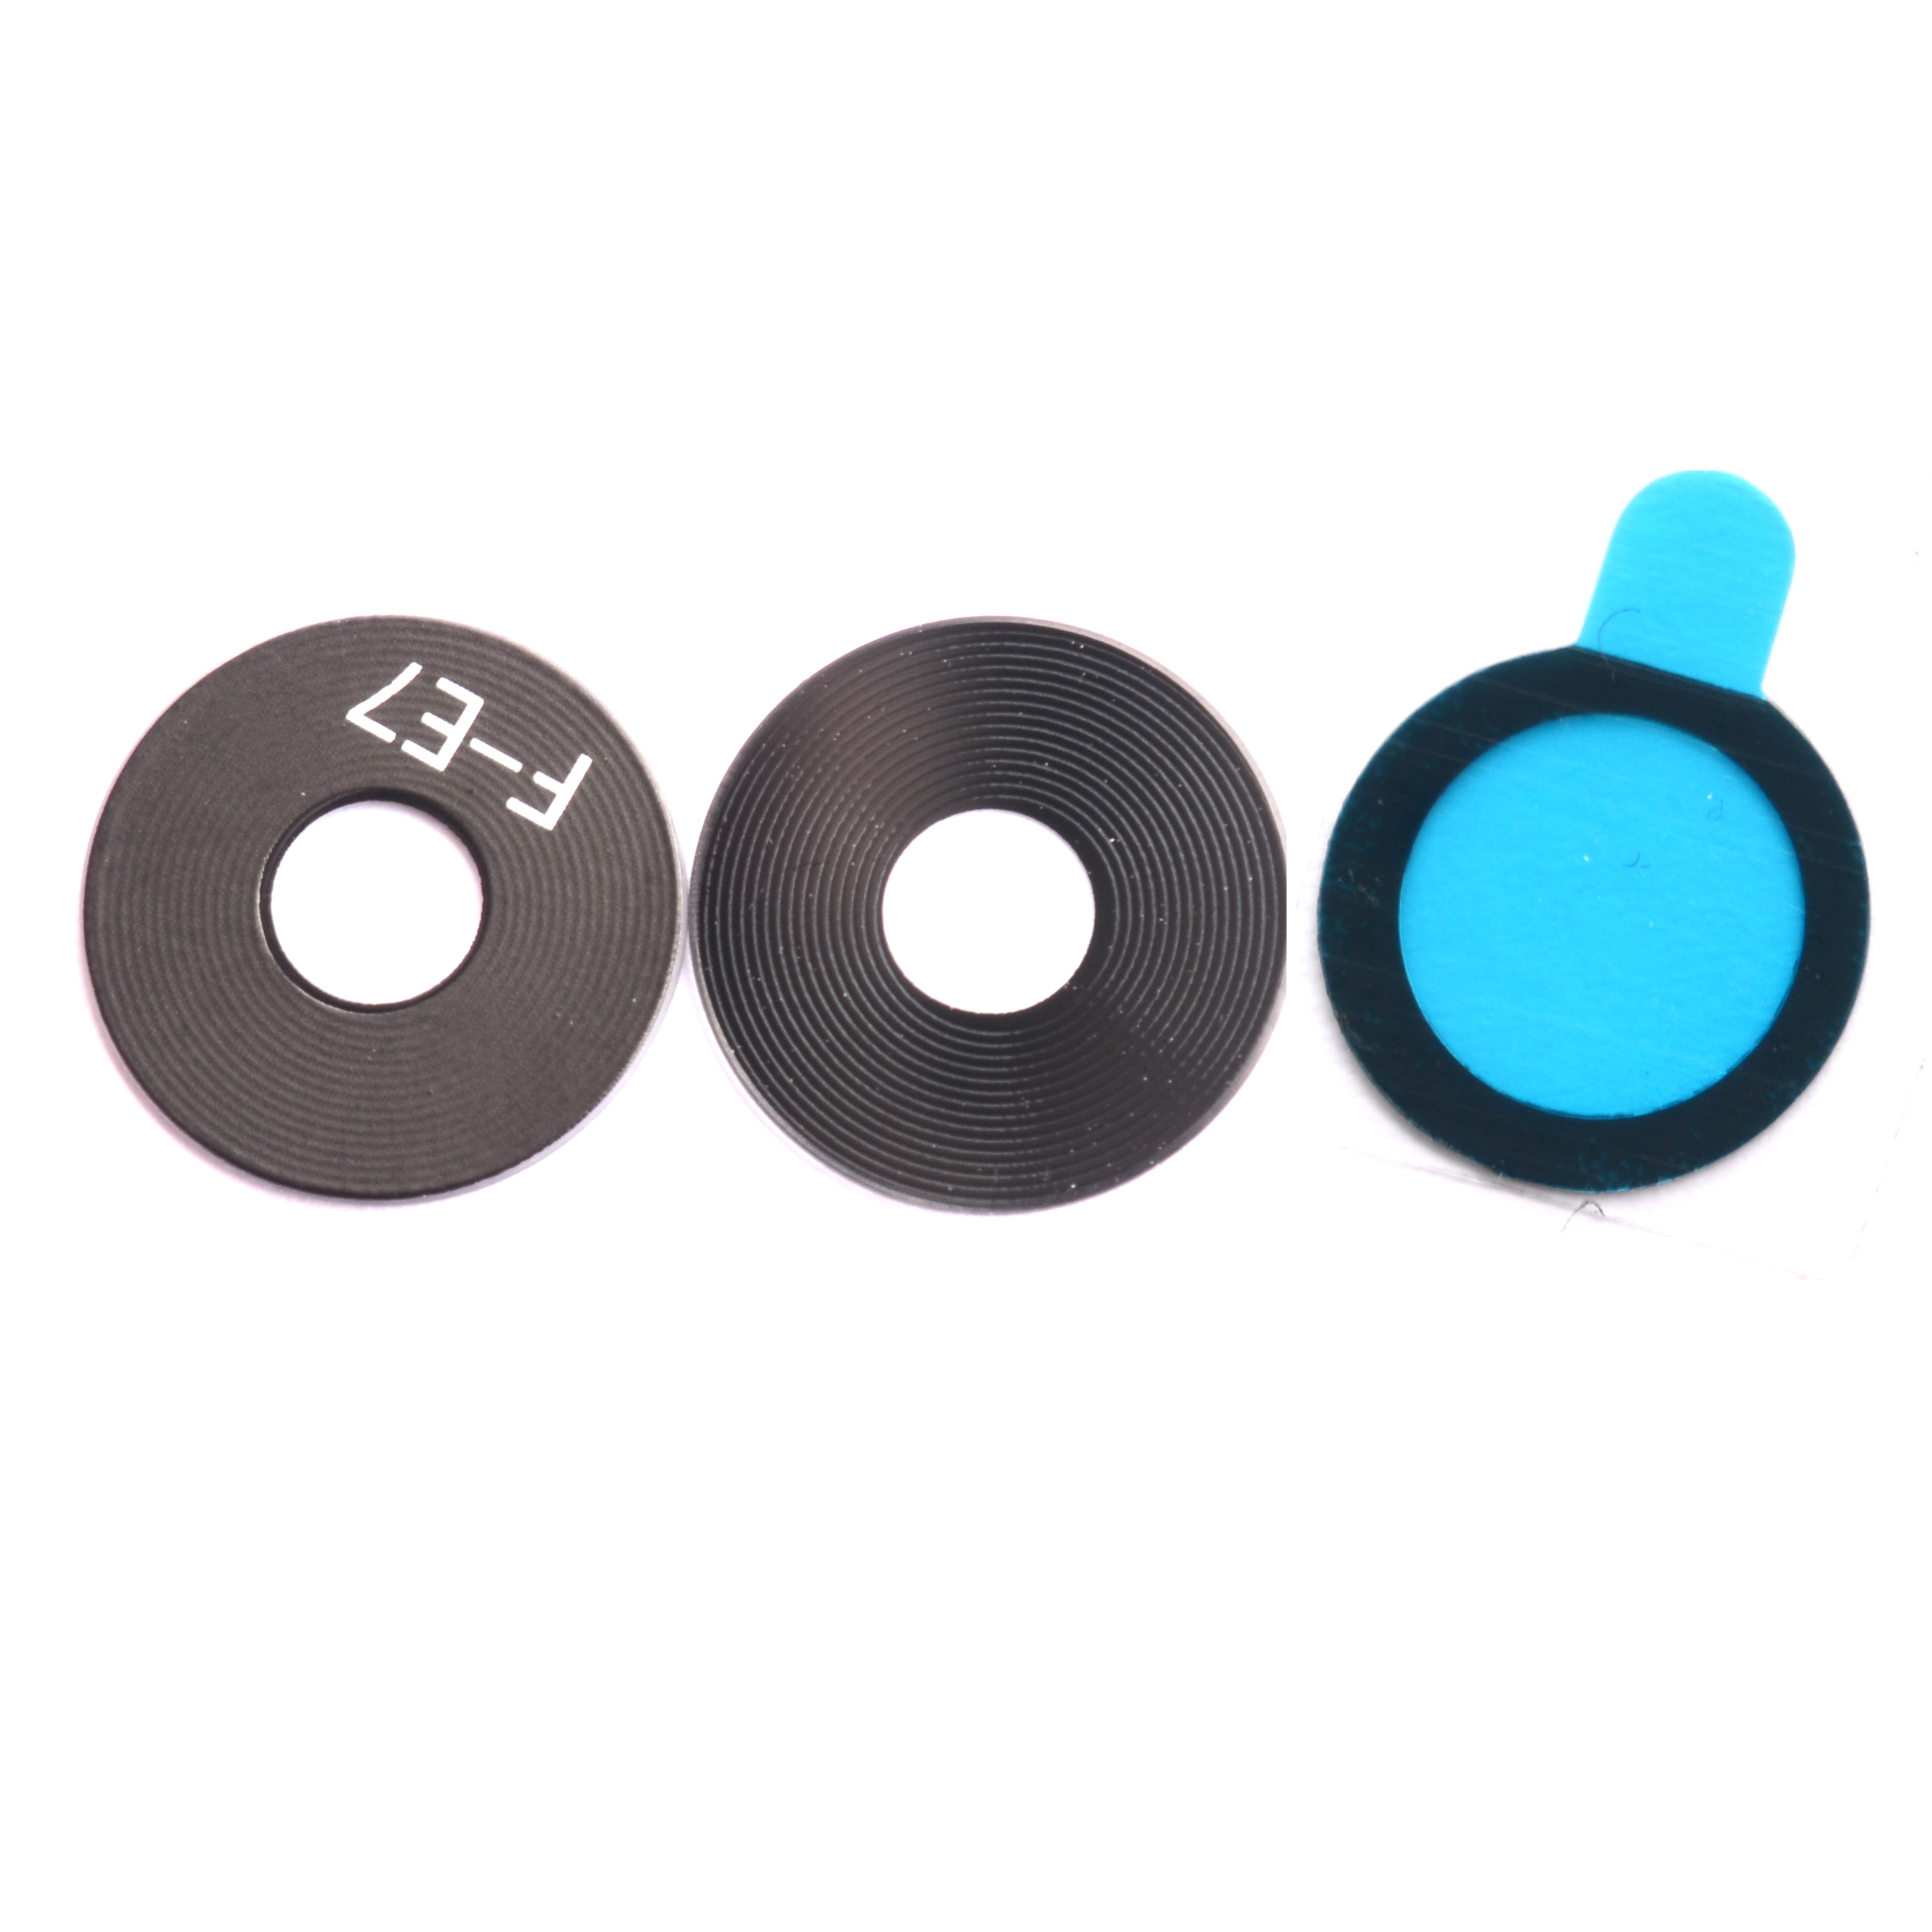 2x New Orignal Rear Back Camera Glass Lens For Xiaomi Redmi 5 Plus Redmi Note 4 Note4